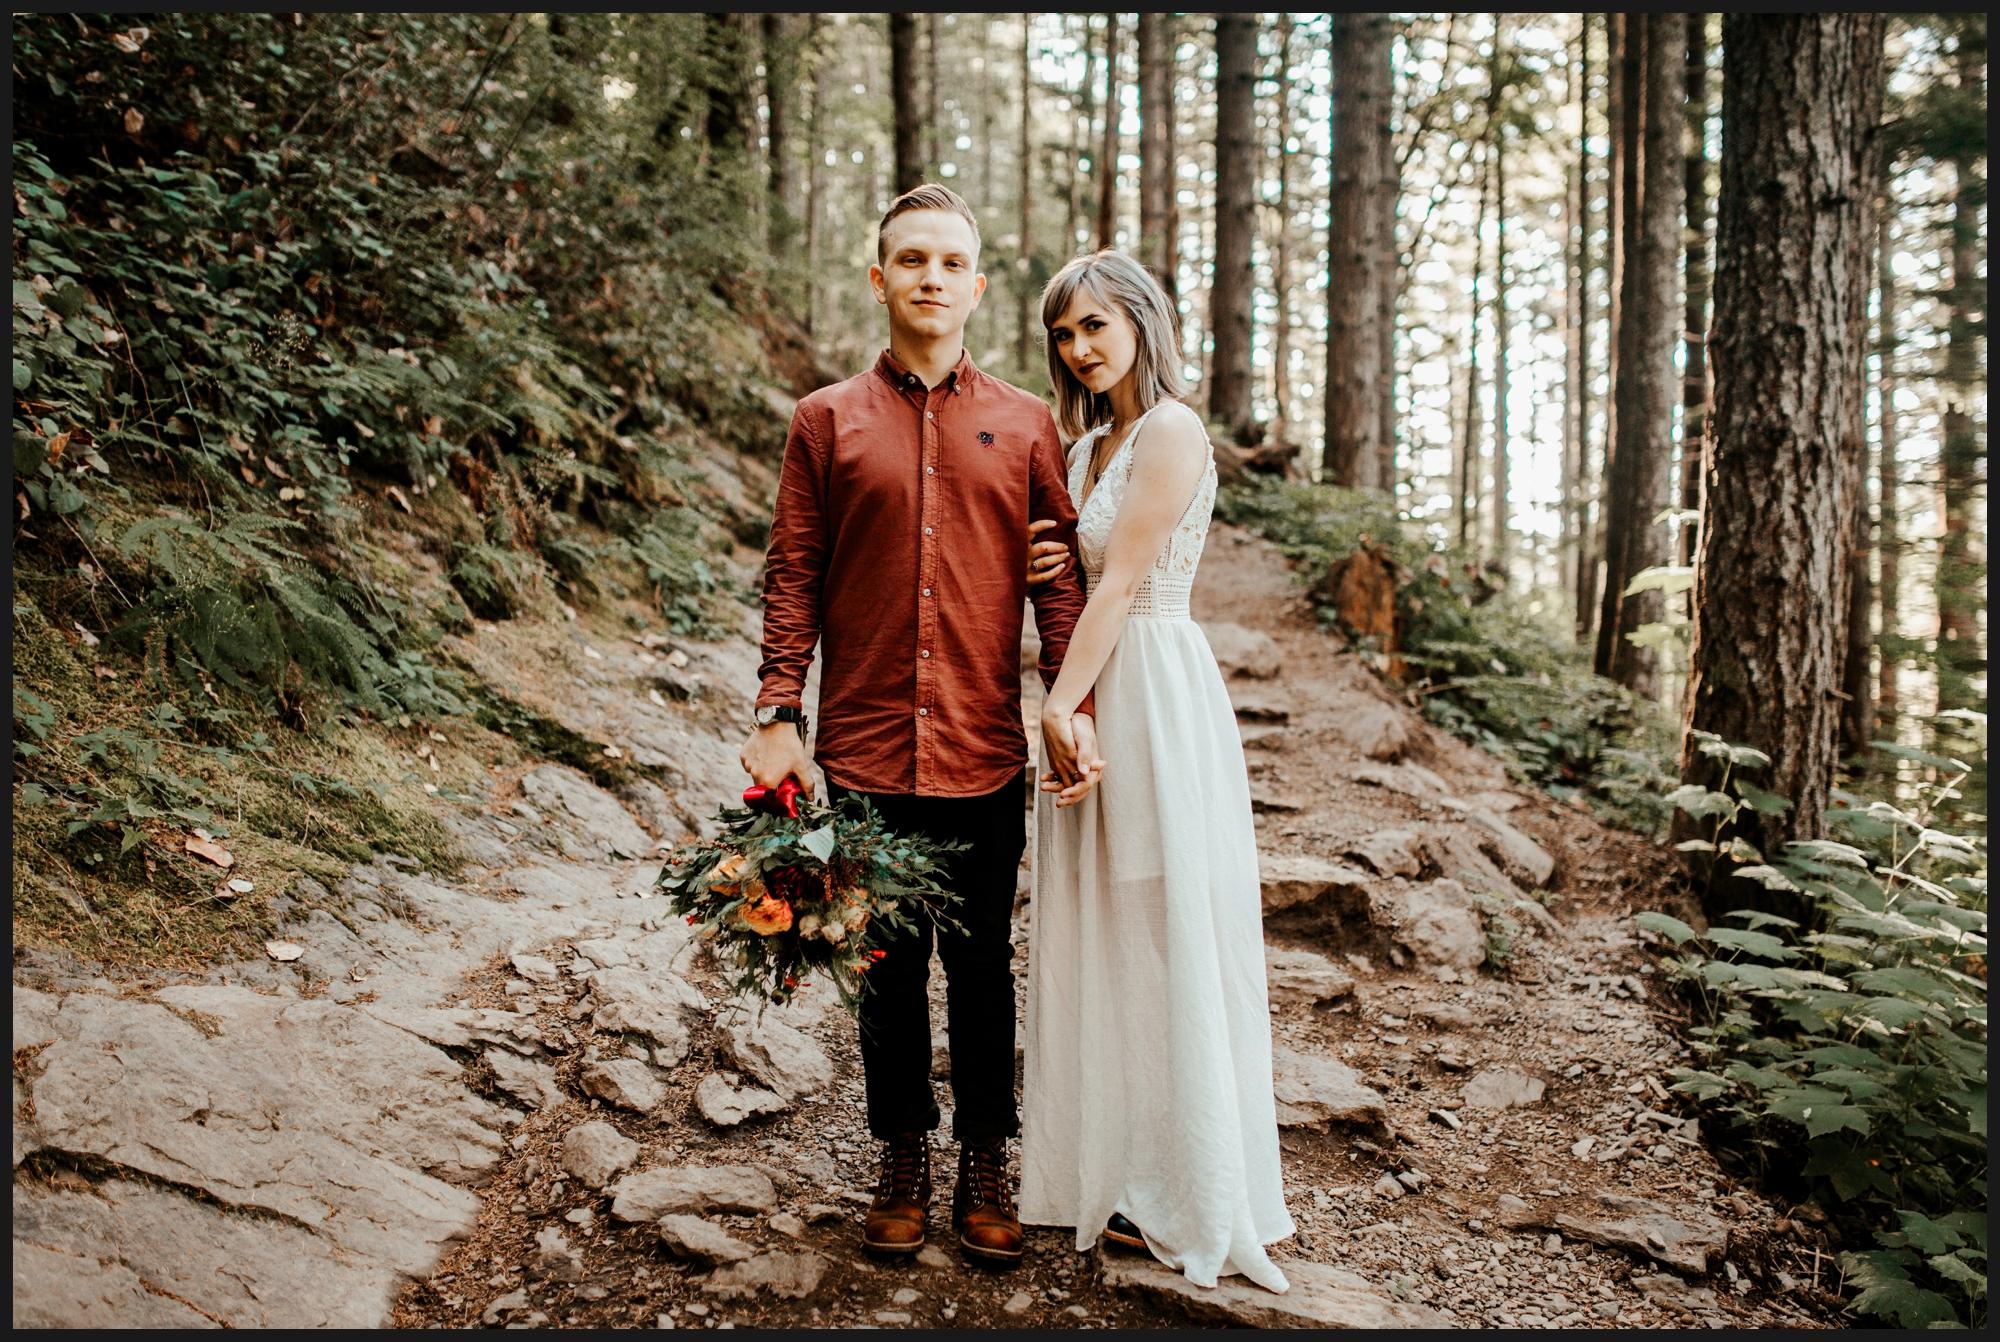 Orlando-Wedding-Photographer-destination-wedding-photographer-florida-wedding-photographer-bohemian-wedding-photographer_0460.jpg